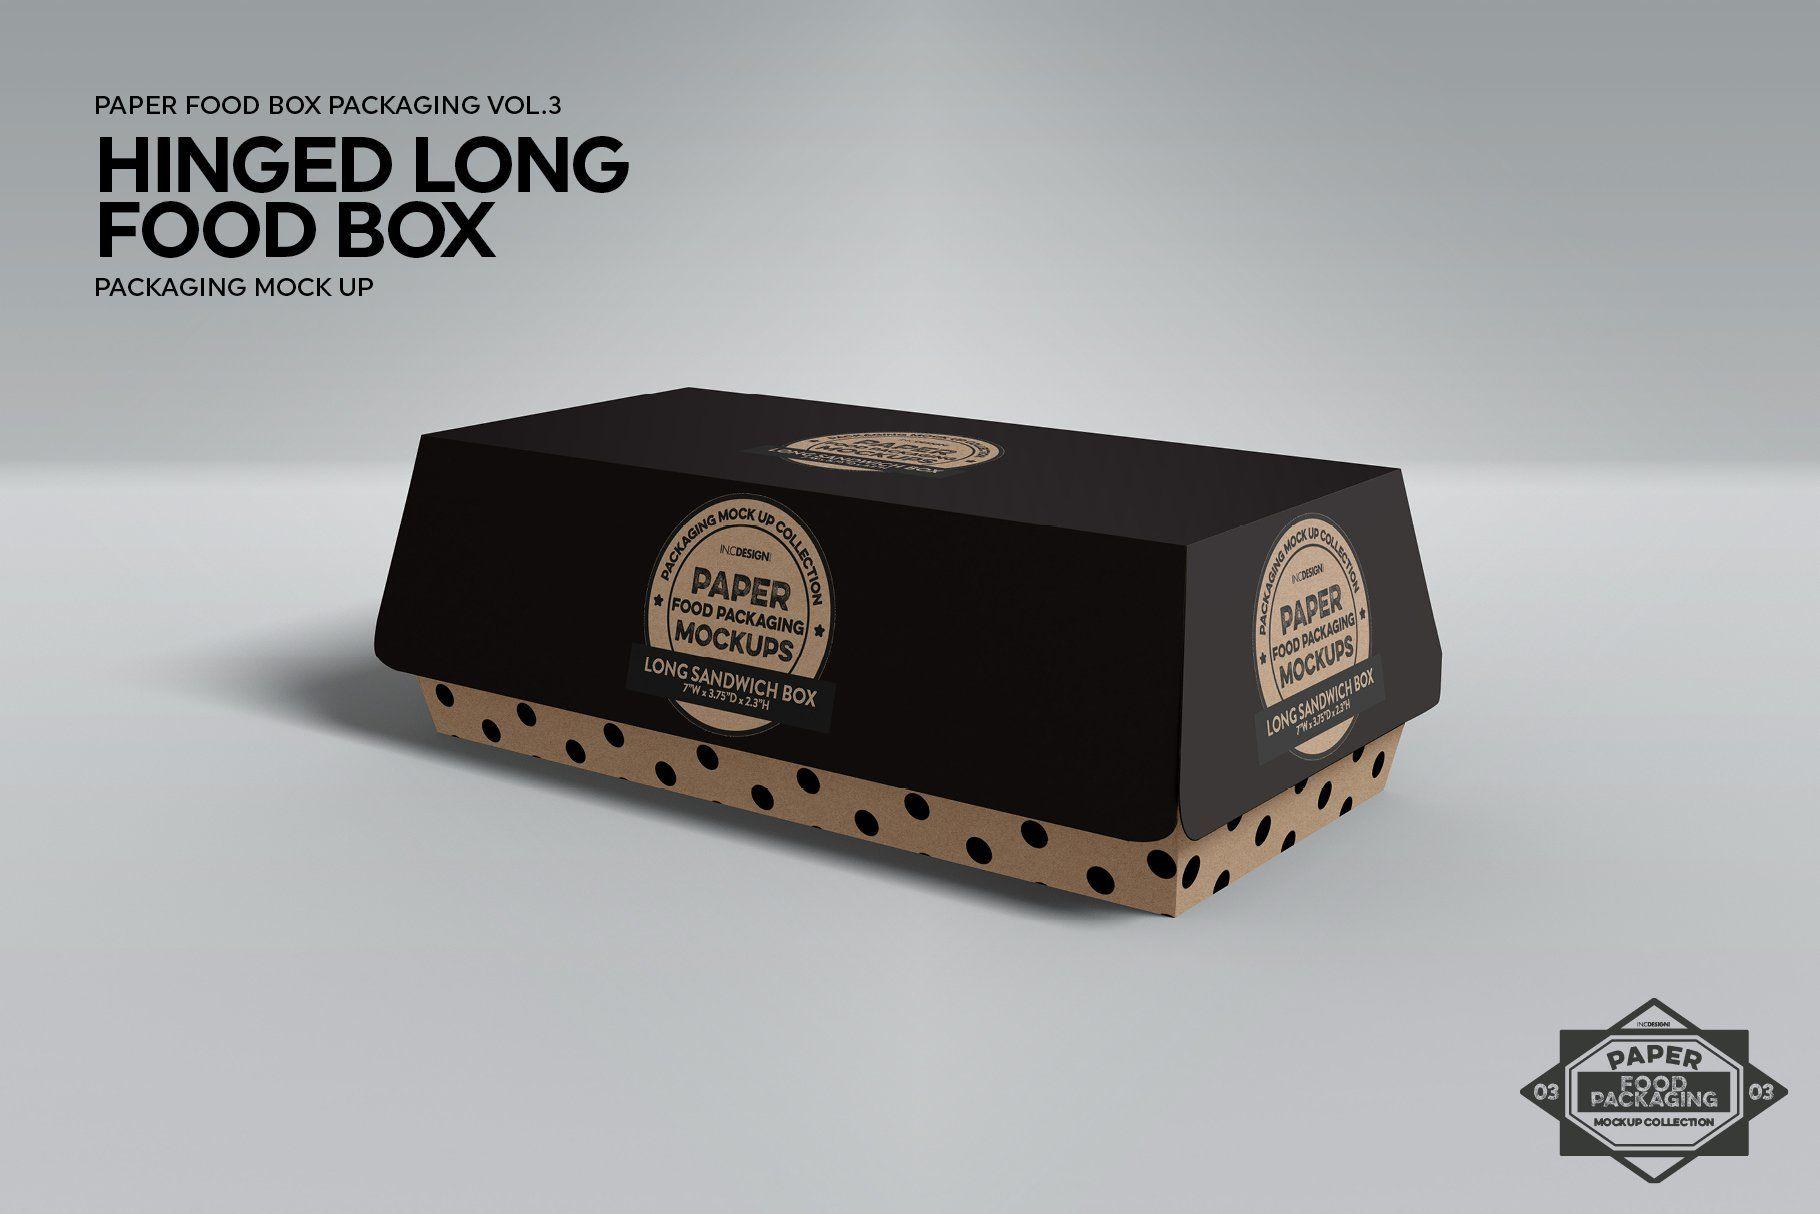 Download Hinged Long Sandwich Box Mockup Box Mockup Free Packaging Mockup Food Box Packaging